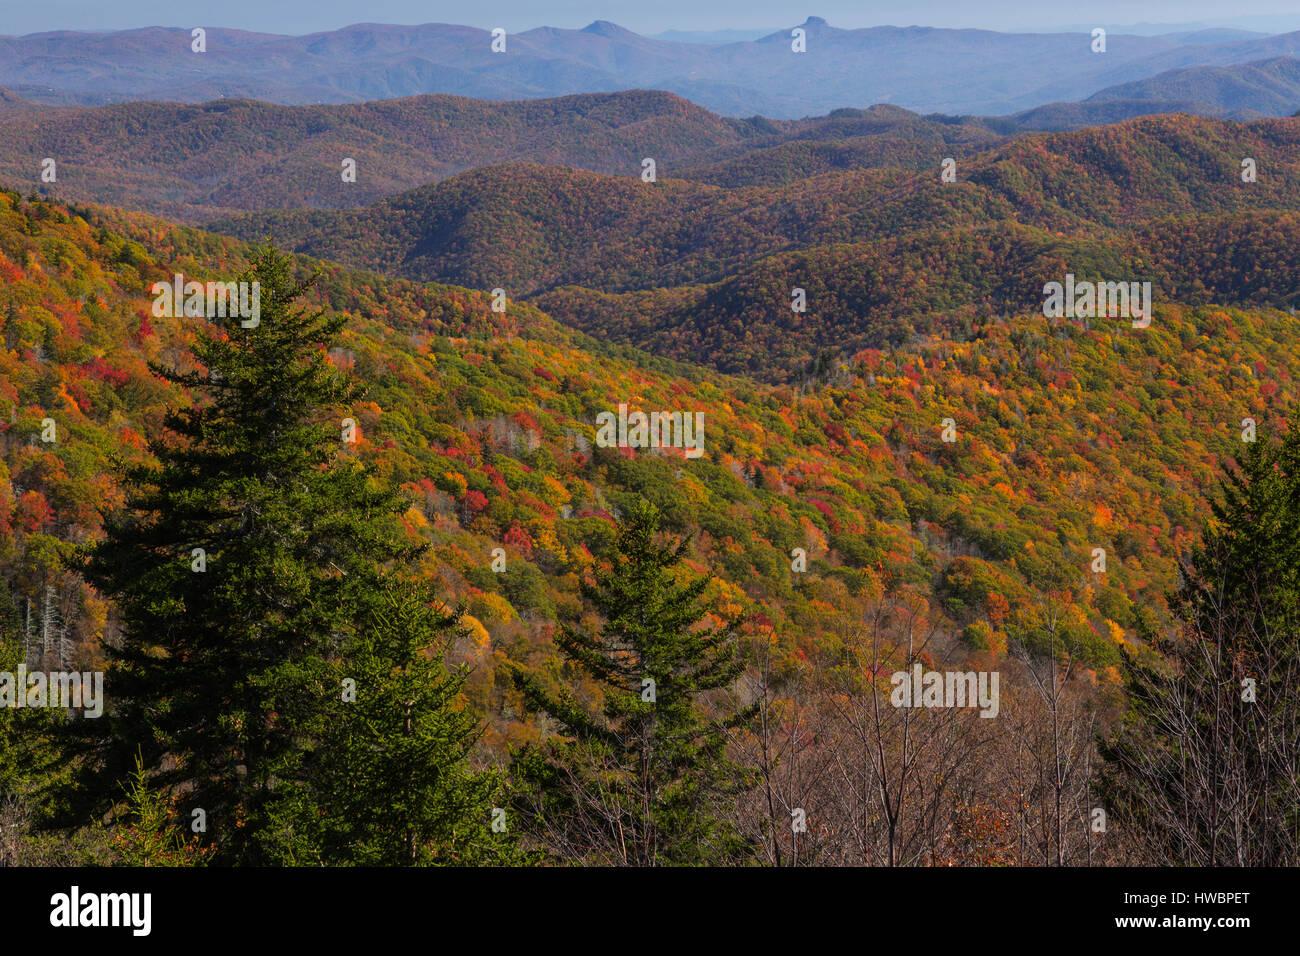 Fall colors along the Blue Ridge Parkway, NC, USA - Stock Image